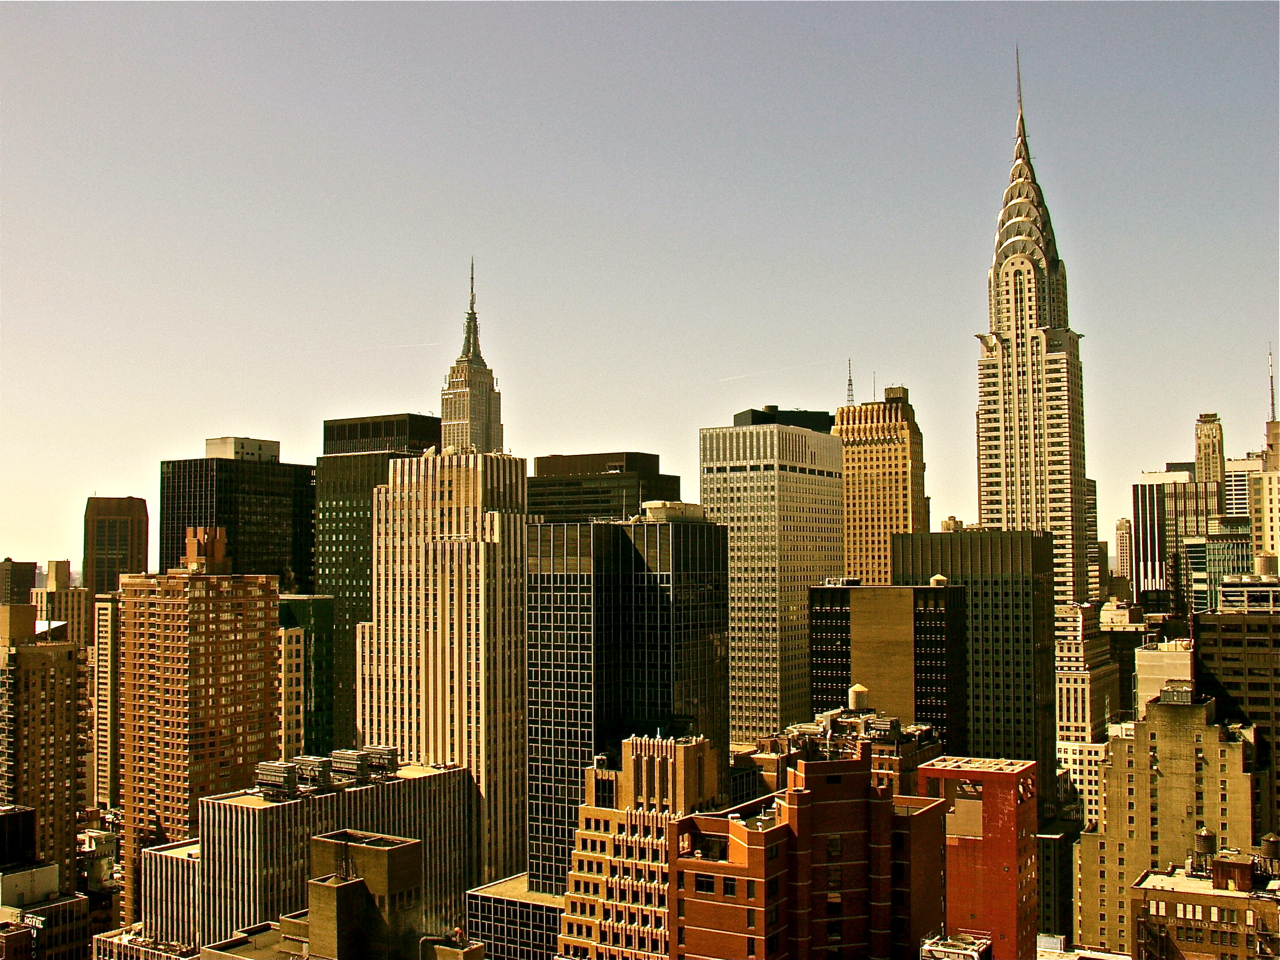 http://2.bp.blogspot.com/-80aVsfb31eI/T8D31ox3m5I/AAAAAAAABWc/nNaPii_1zoA/s1600/New+York+Skyline+%28Midtown%29,+photograph,+2006.jpg